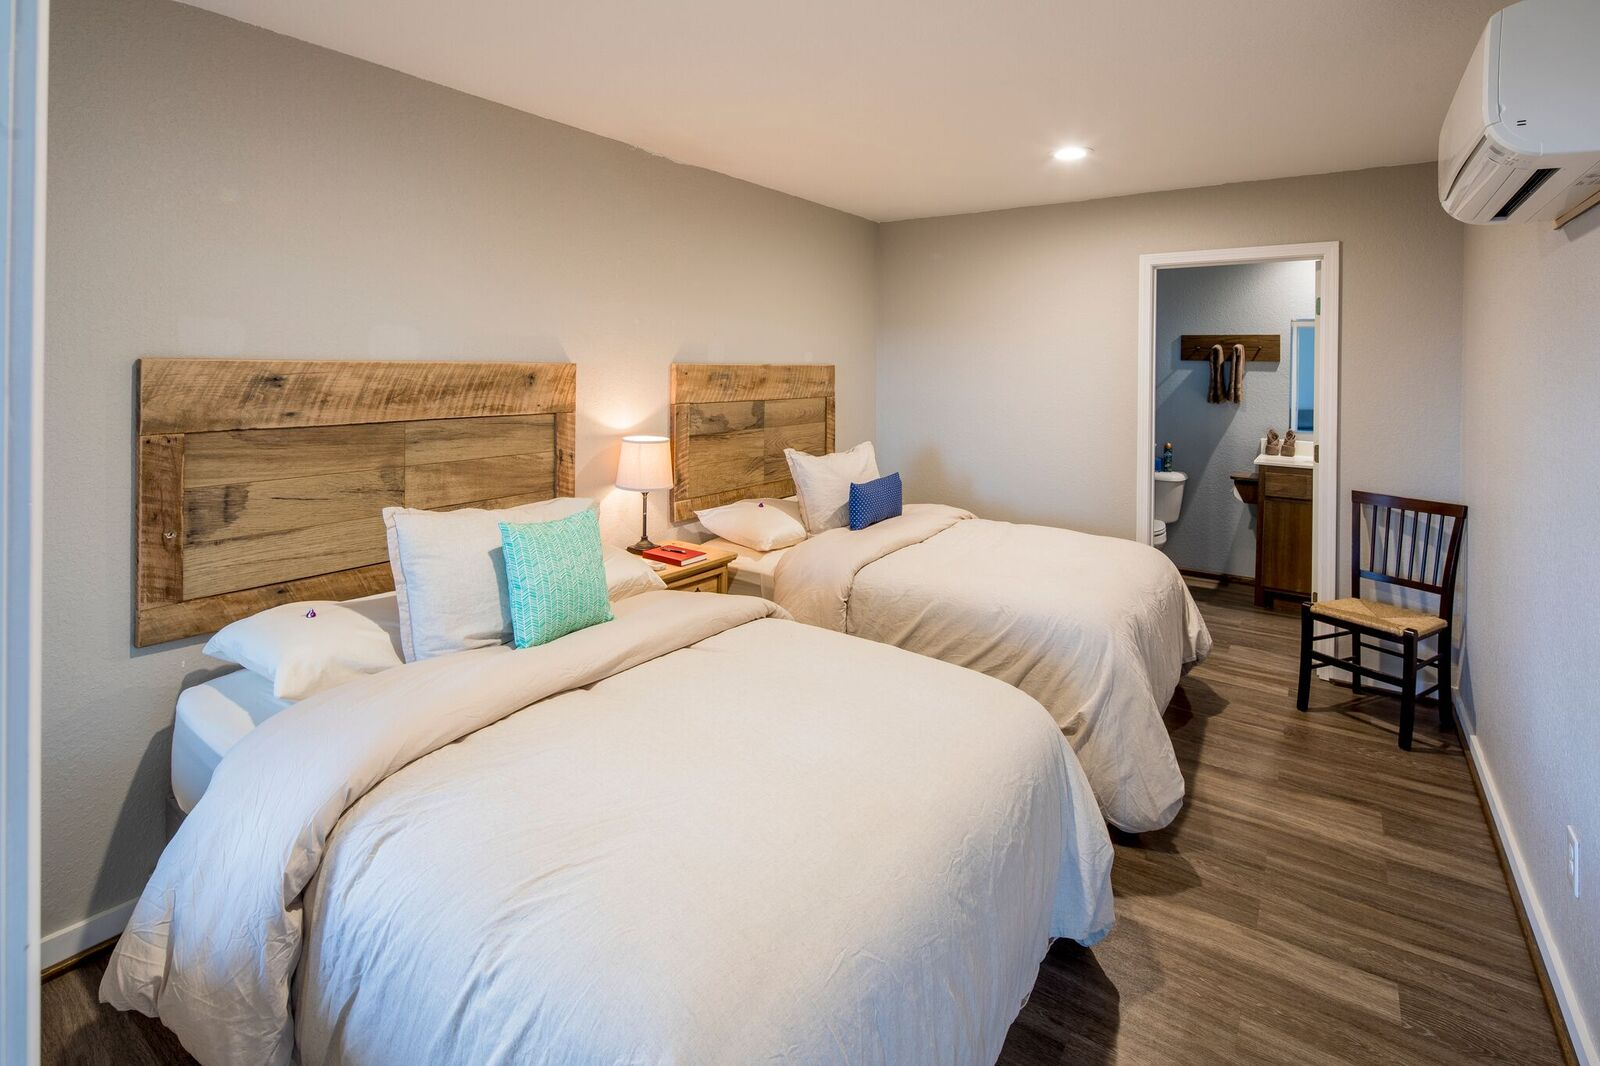 Lower Level - Hotel Room 1.jpeg